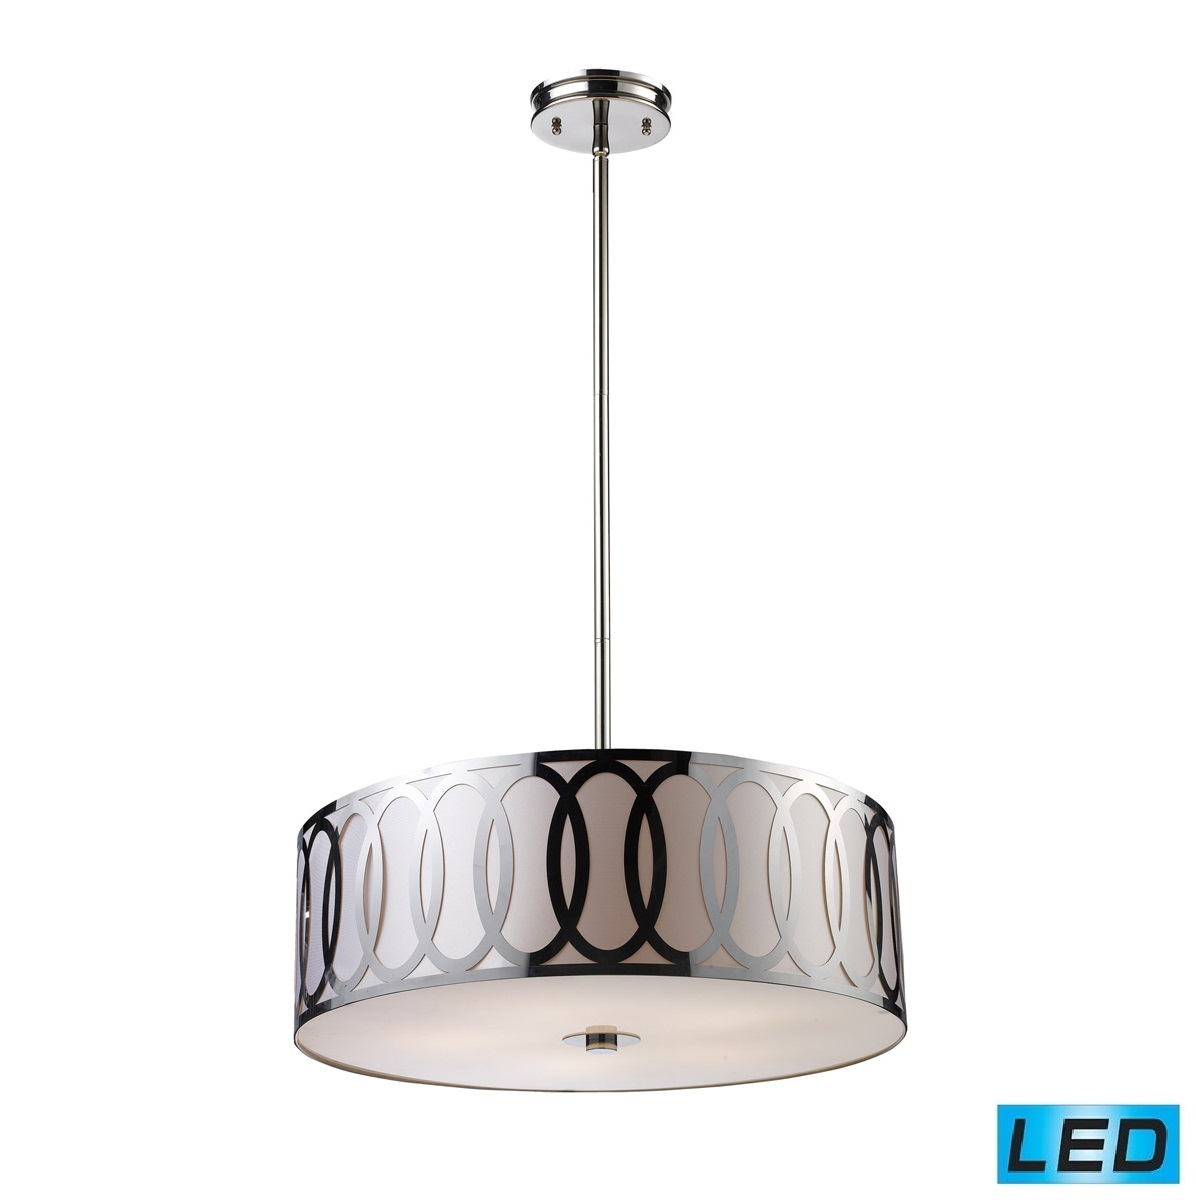 ELK Lighting Anastasia 10174 Pendant Lighting Brooklyn, New York - Accentuations Brand